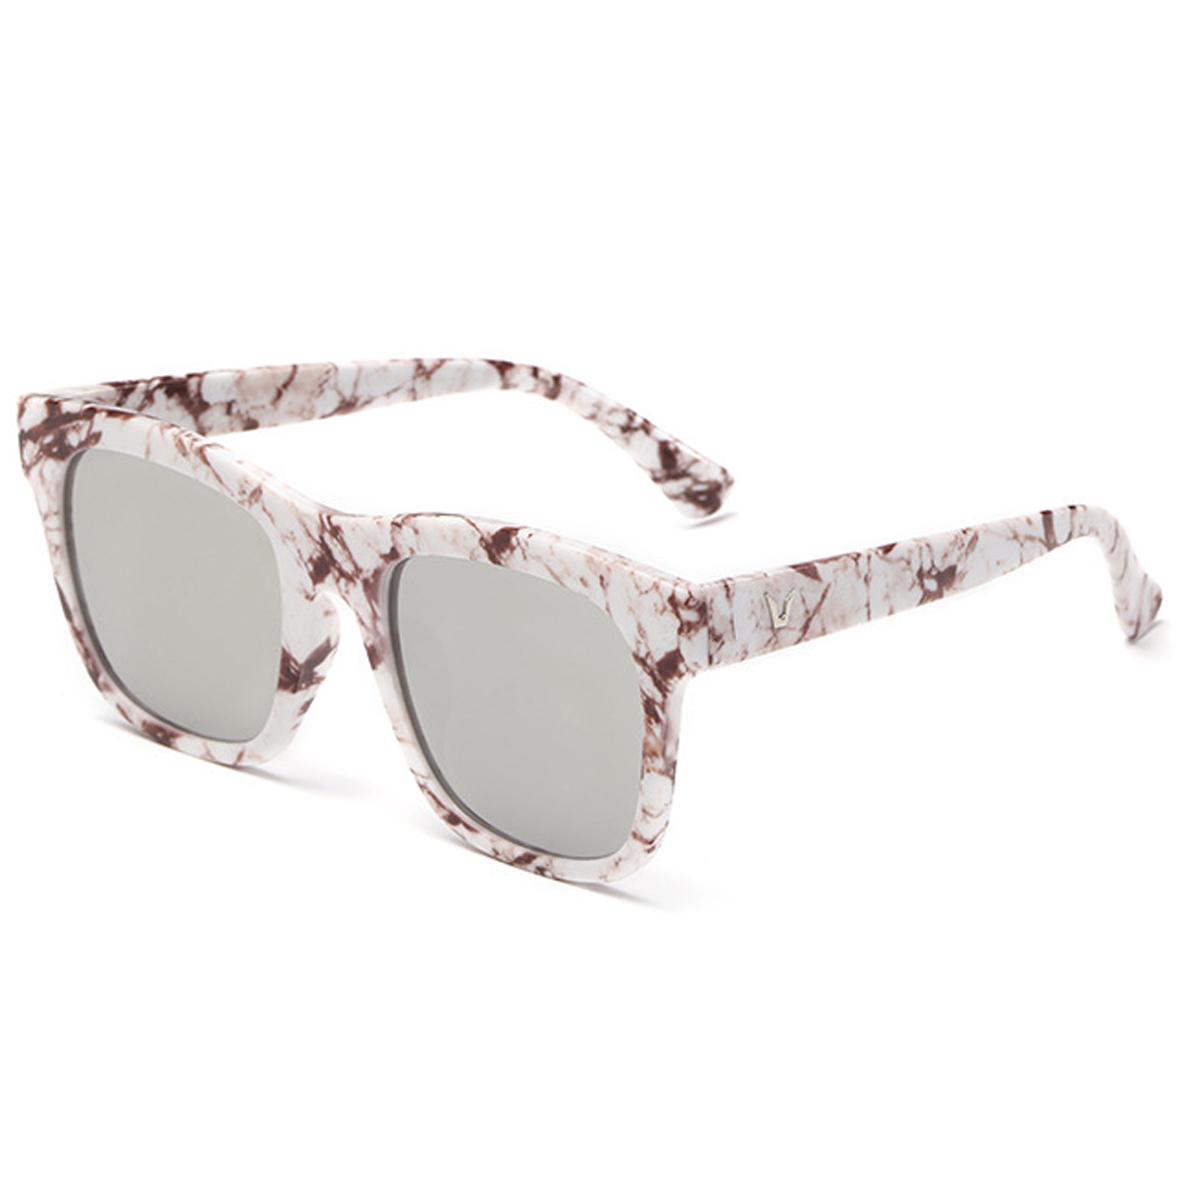 Classic Fashion Men Sunglasses Women Driving Mirror Eyewear 2016 Male Sun glasses Brand Vintage Frame Oculos de sol OLO9720_C9(China (Mainland))